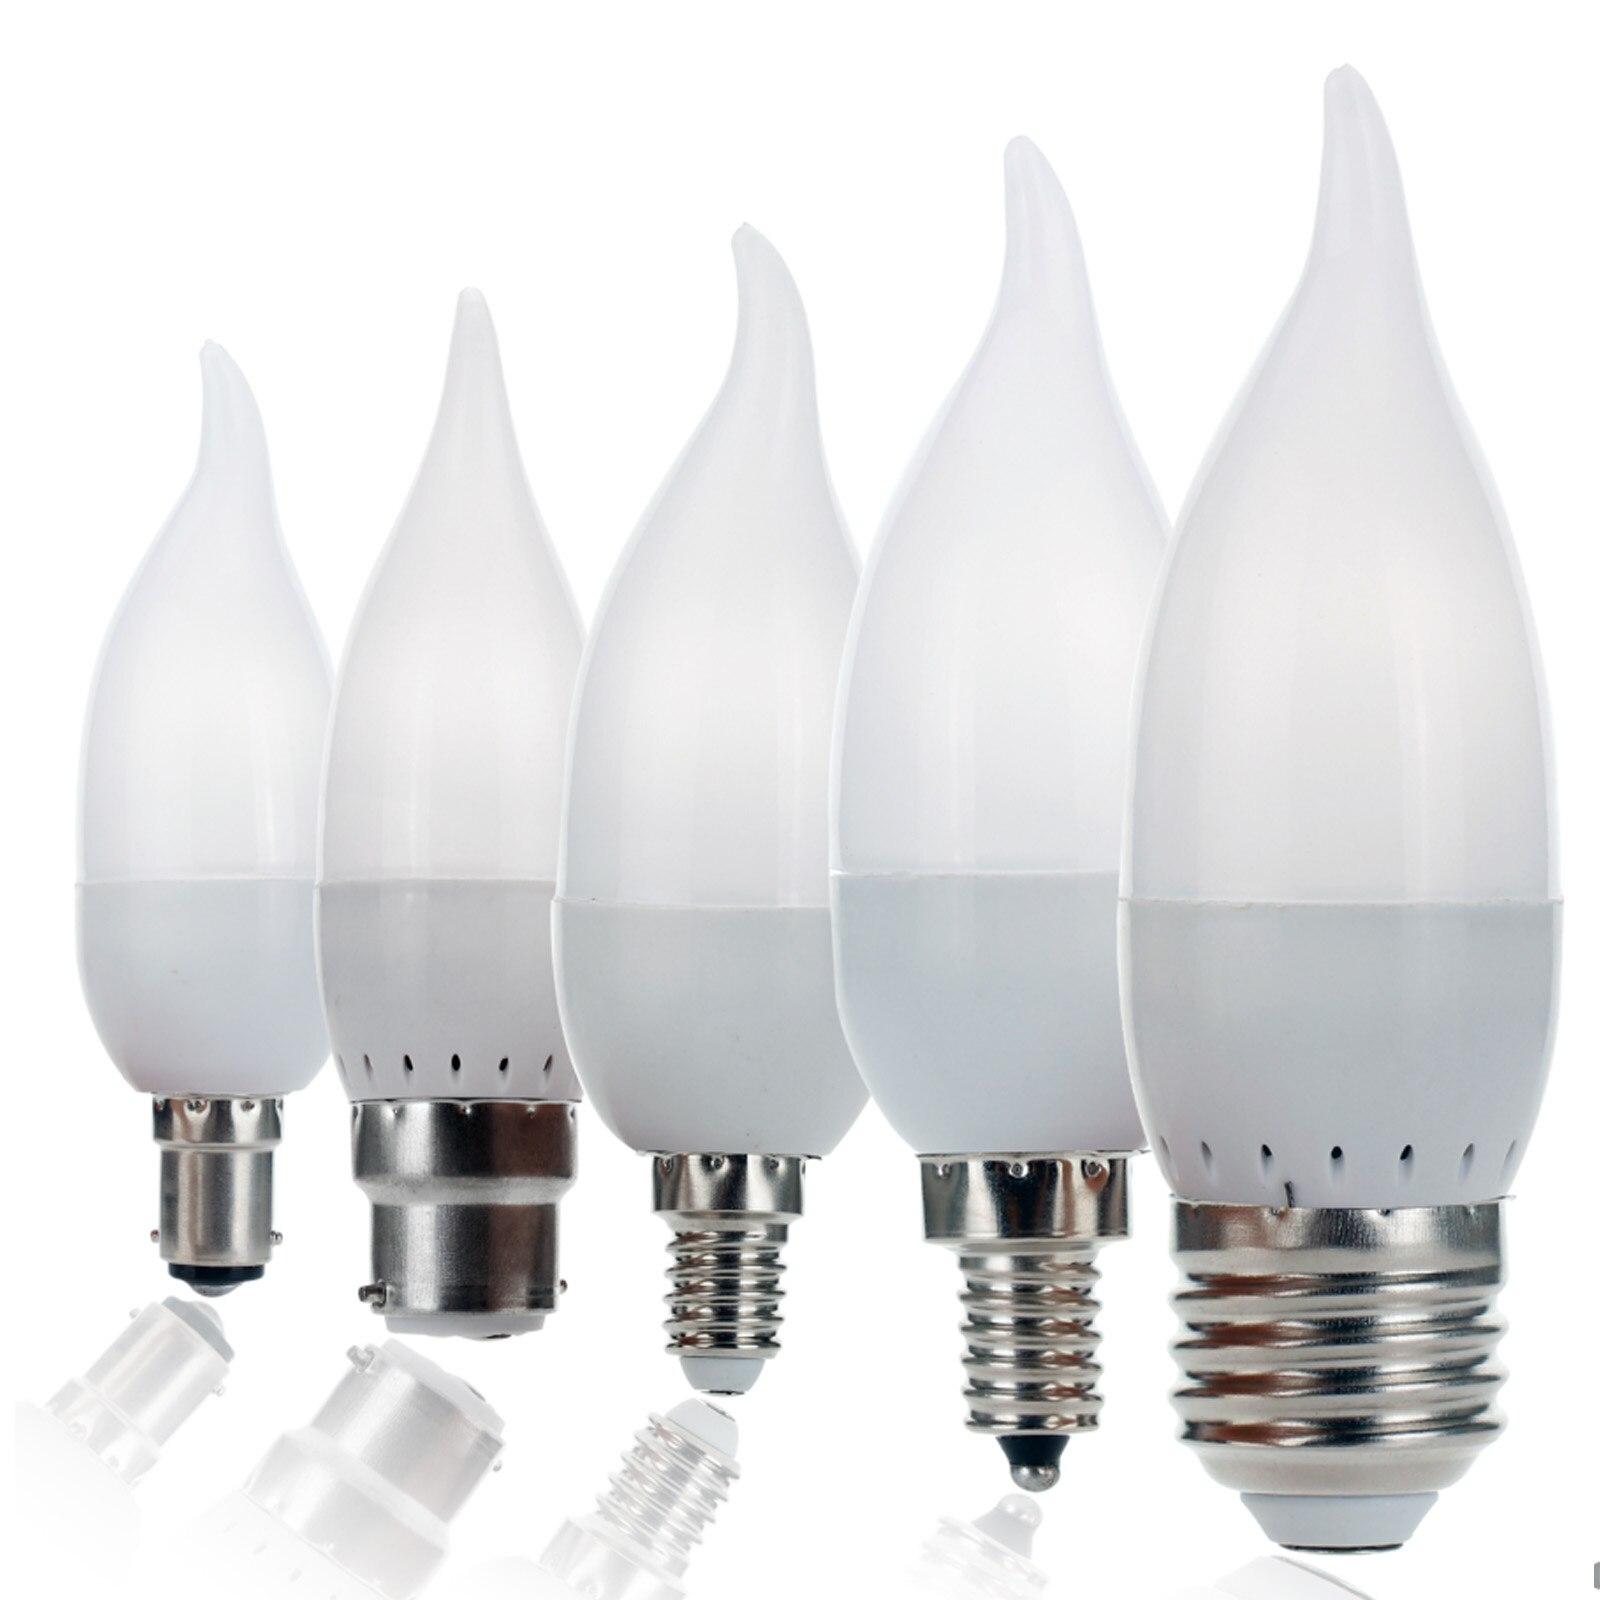 Regulable LED candelabro con llamas bombilla 3W E12 E14 B22 E27 vela...